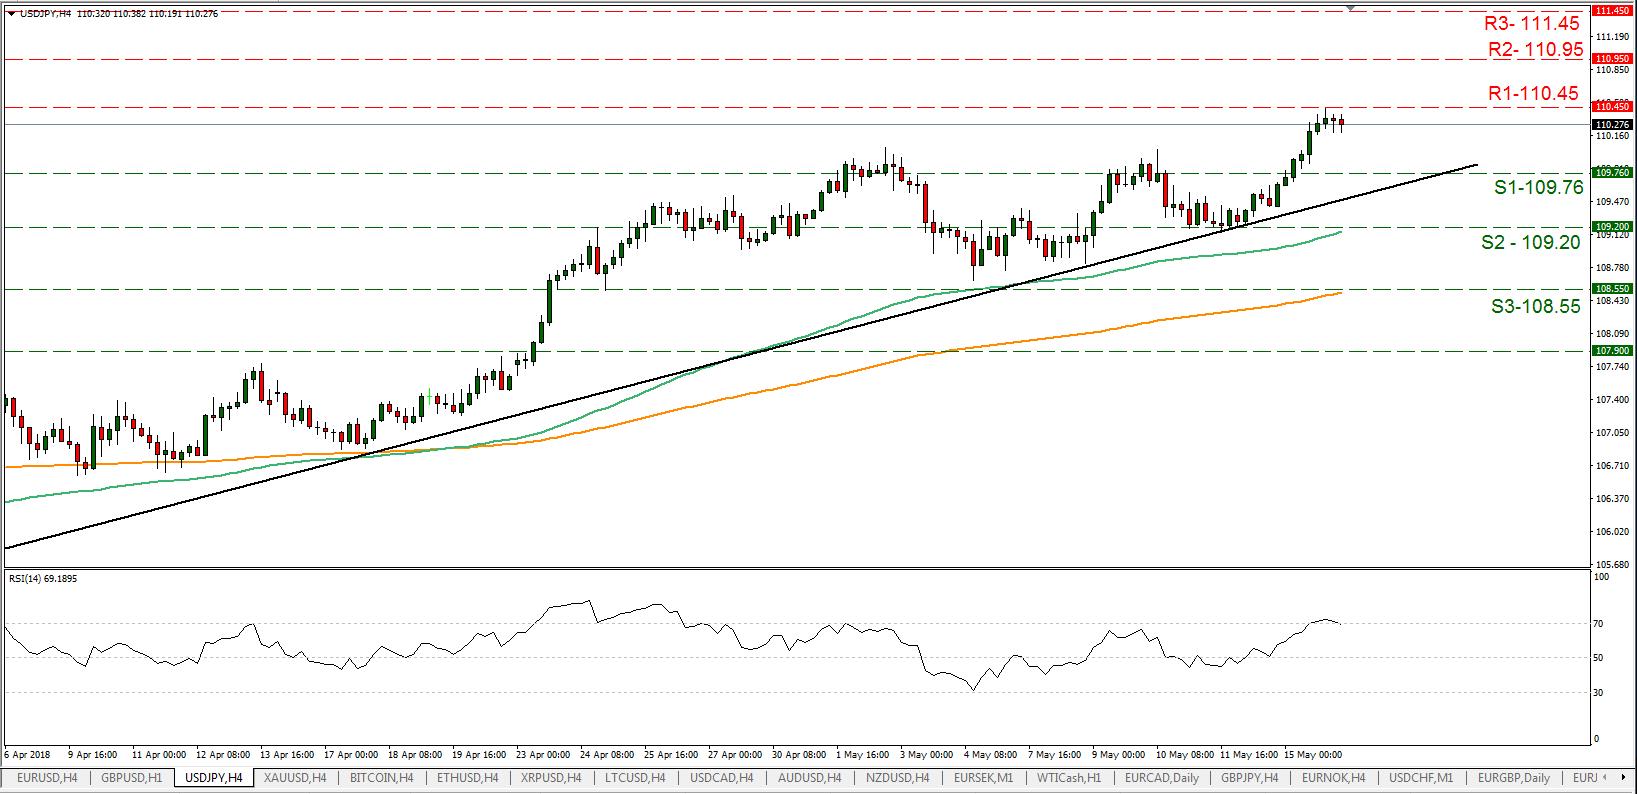 USD/JPY 16/05/2018 | EconAlerts